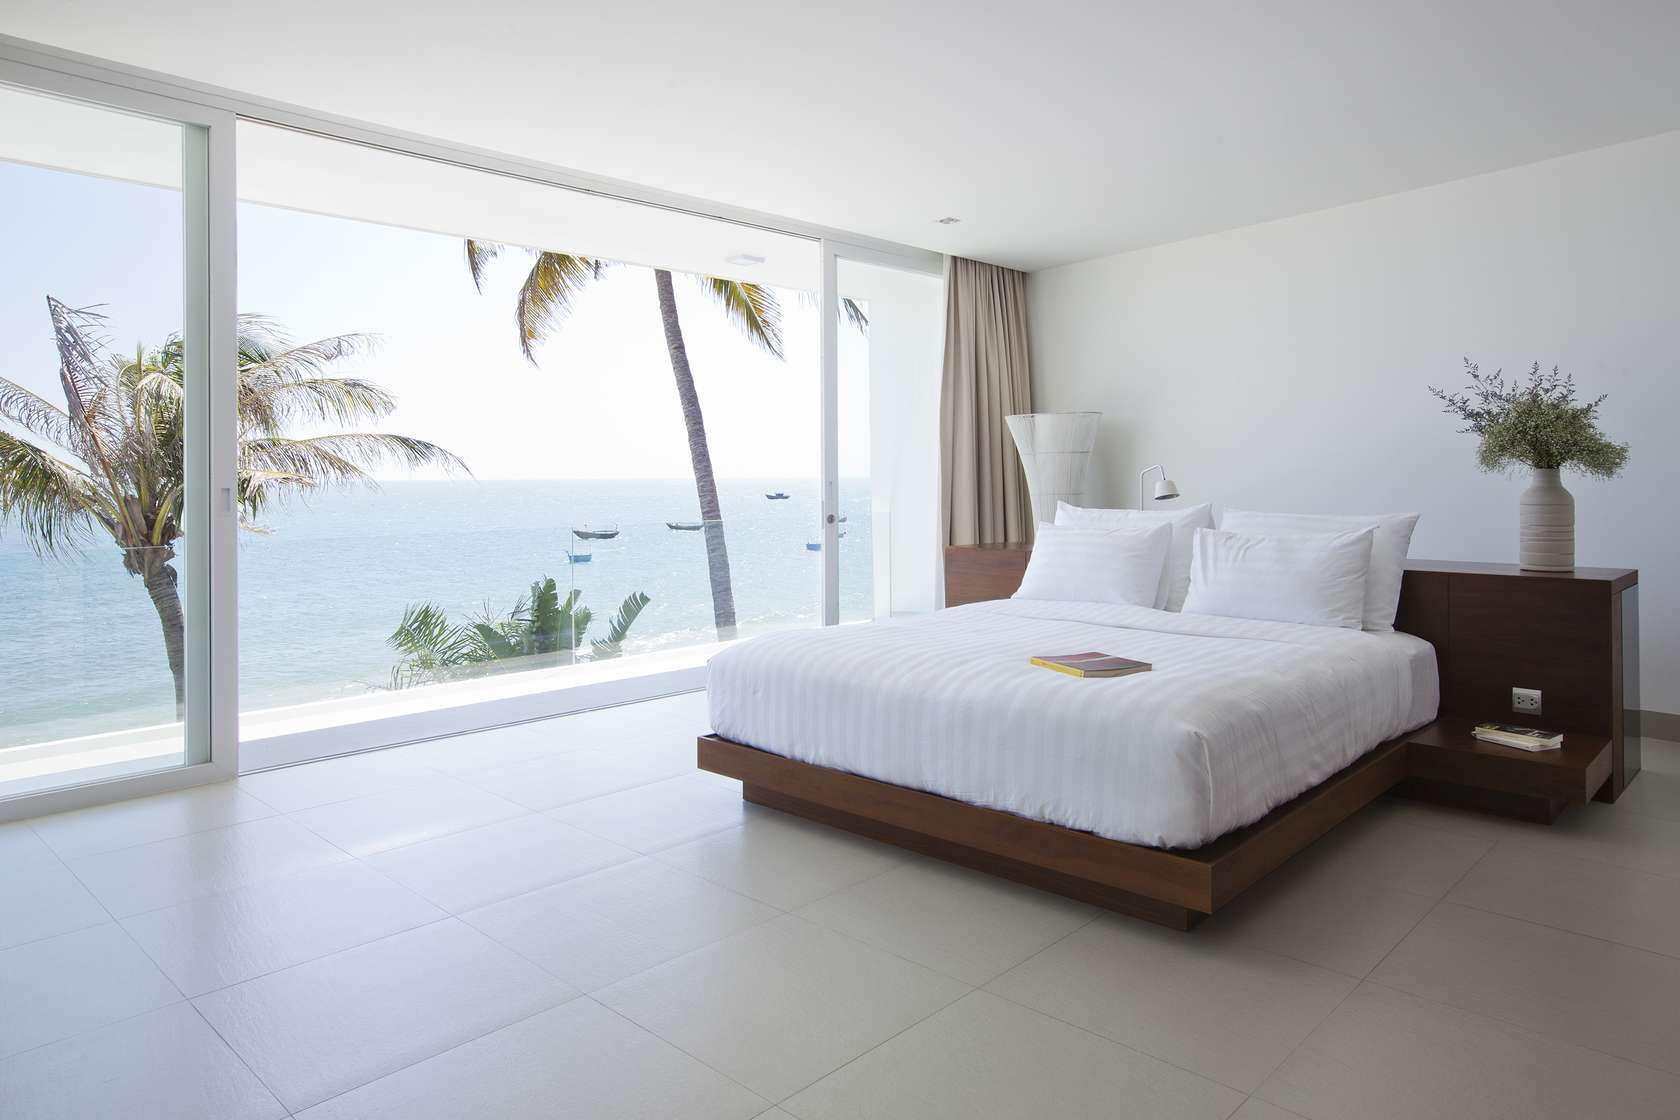 Private Beach Villas Offer Spectacular Ocean Views and ...